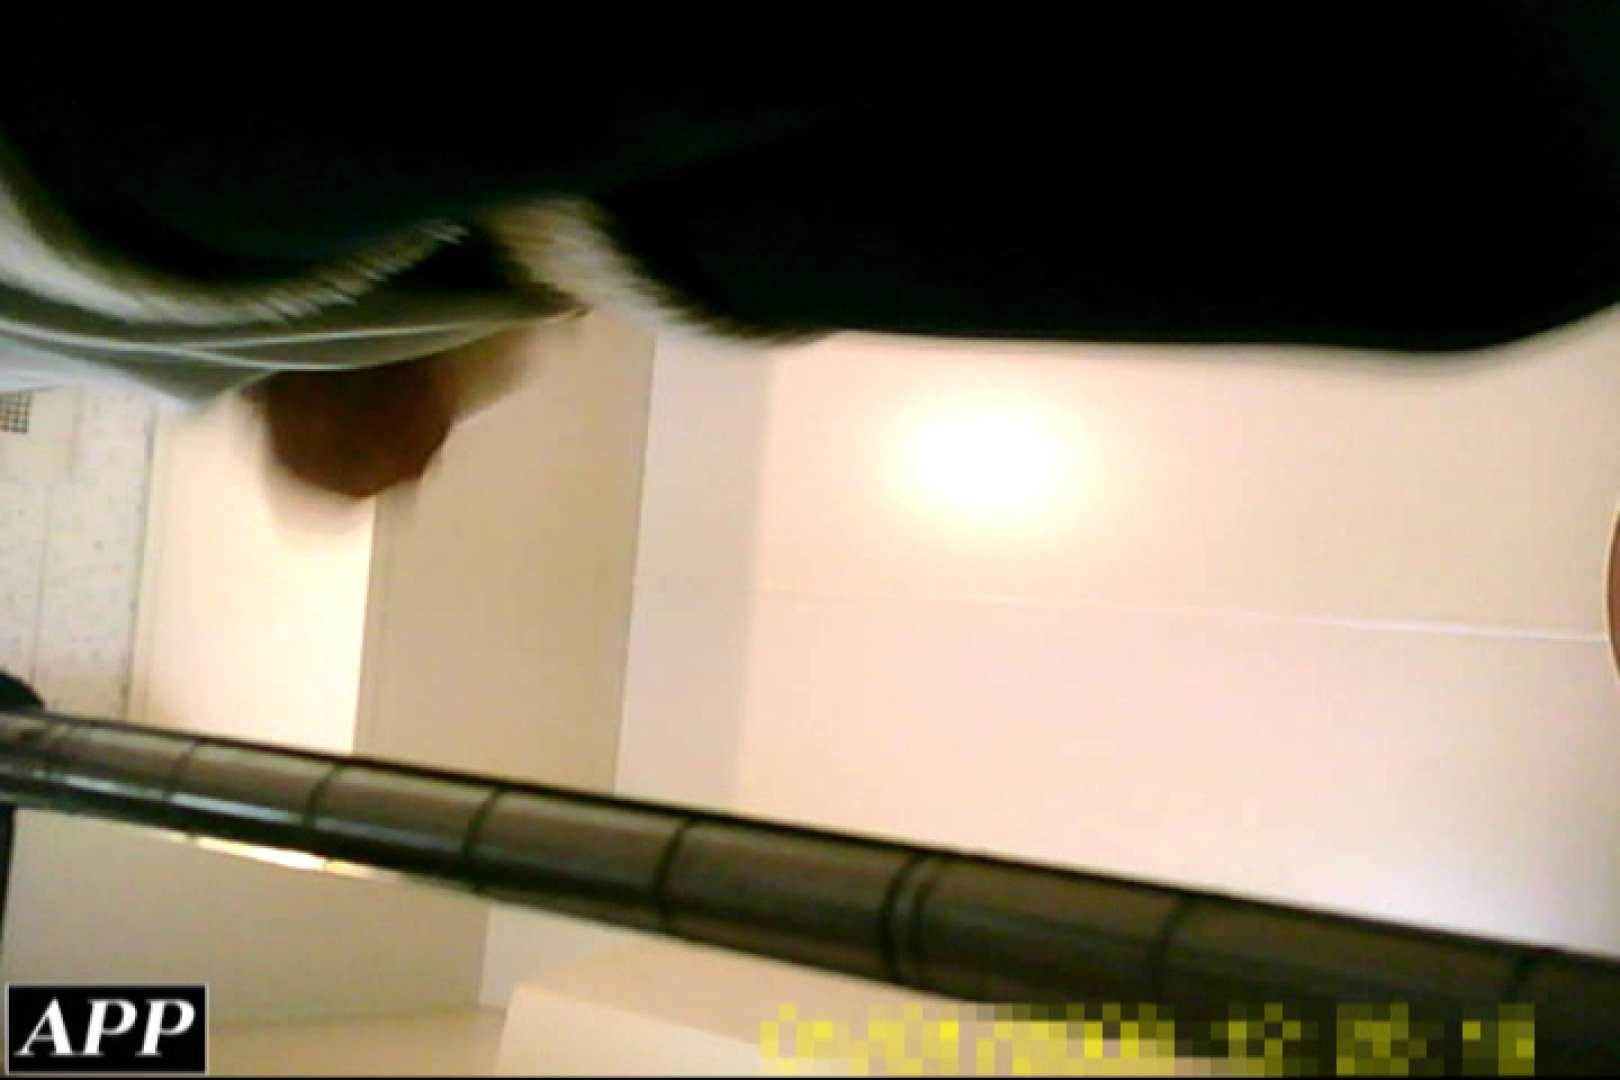 3視点洗面所 vol.57 OLハメ撮り  76Pix 3